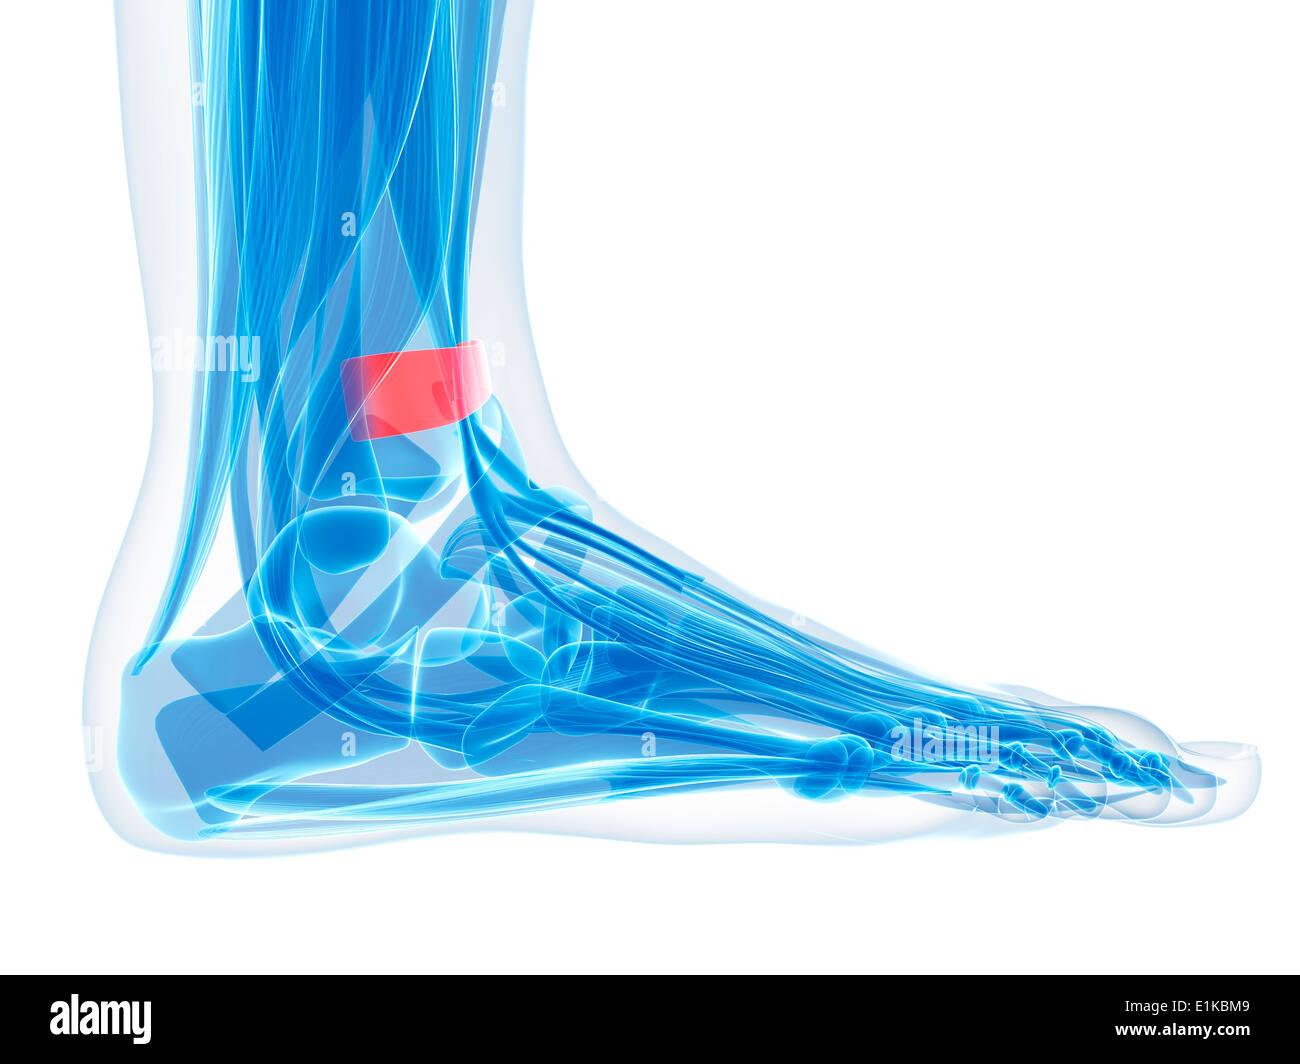 Foot Ligament Stockfotos & Foot Ligament Bilder - Alamy